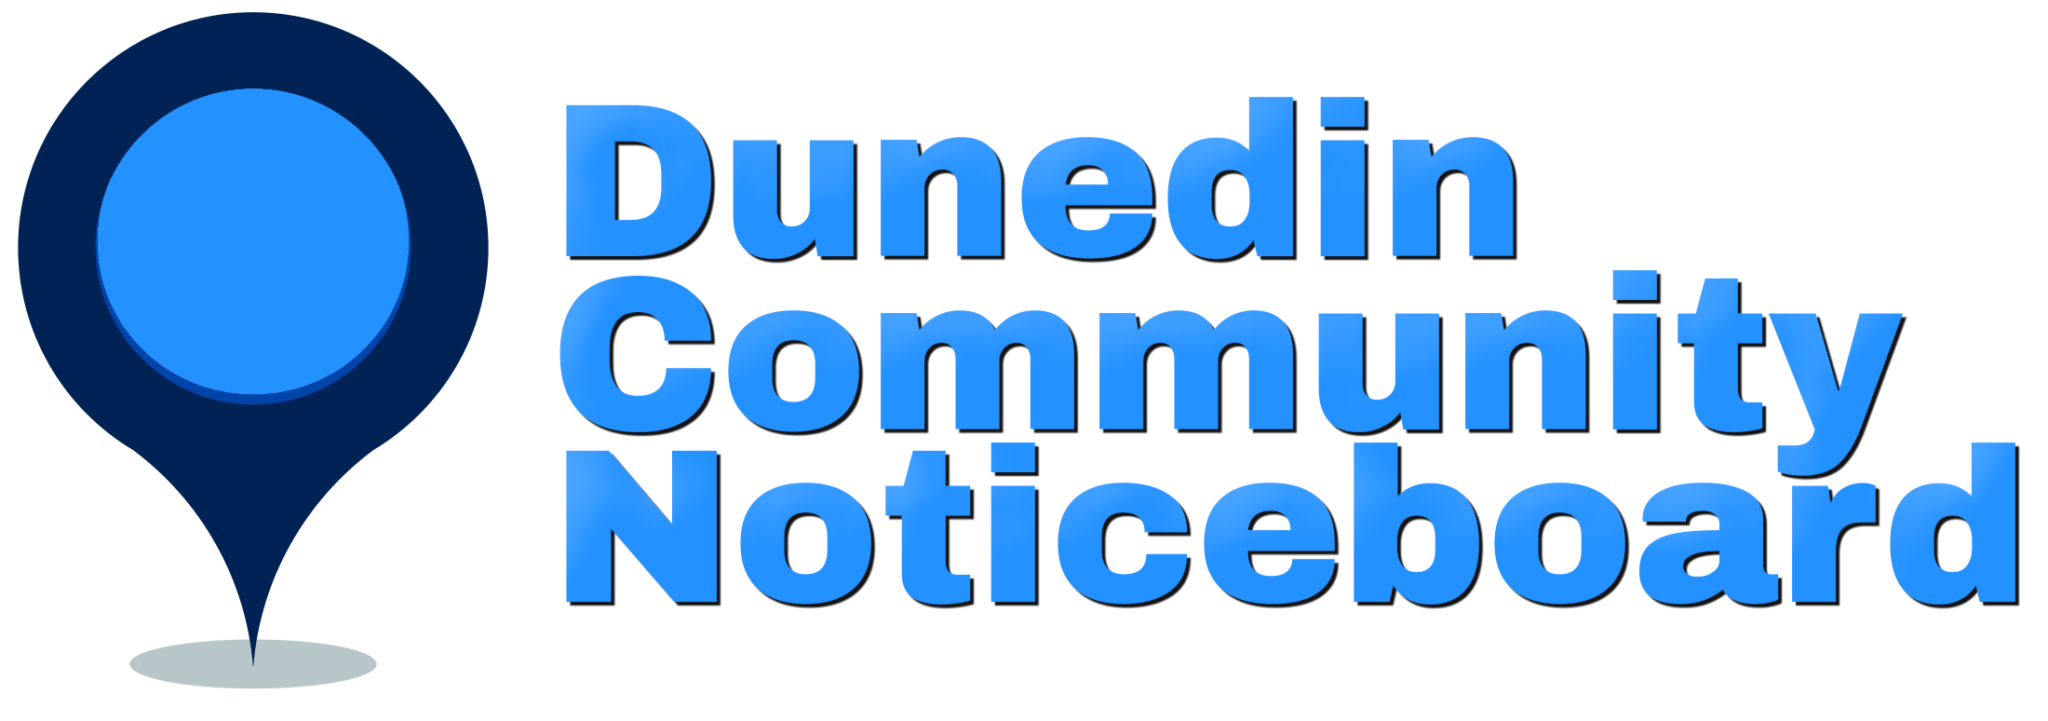 Dunedin Community Noticeboard